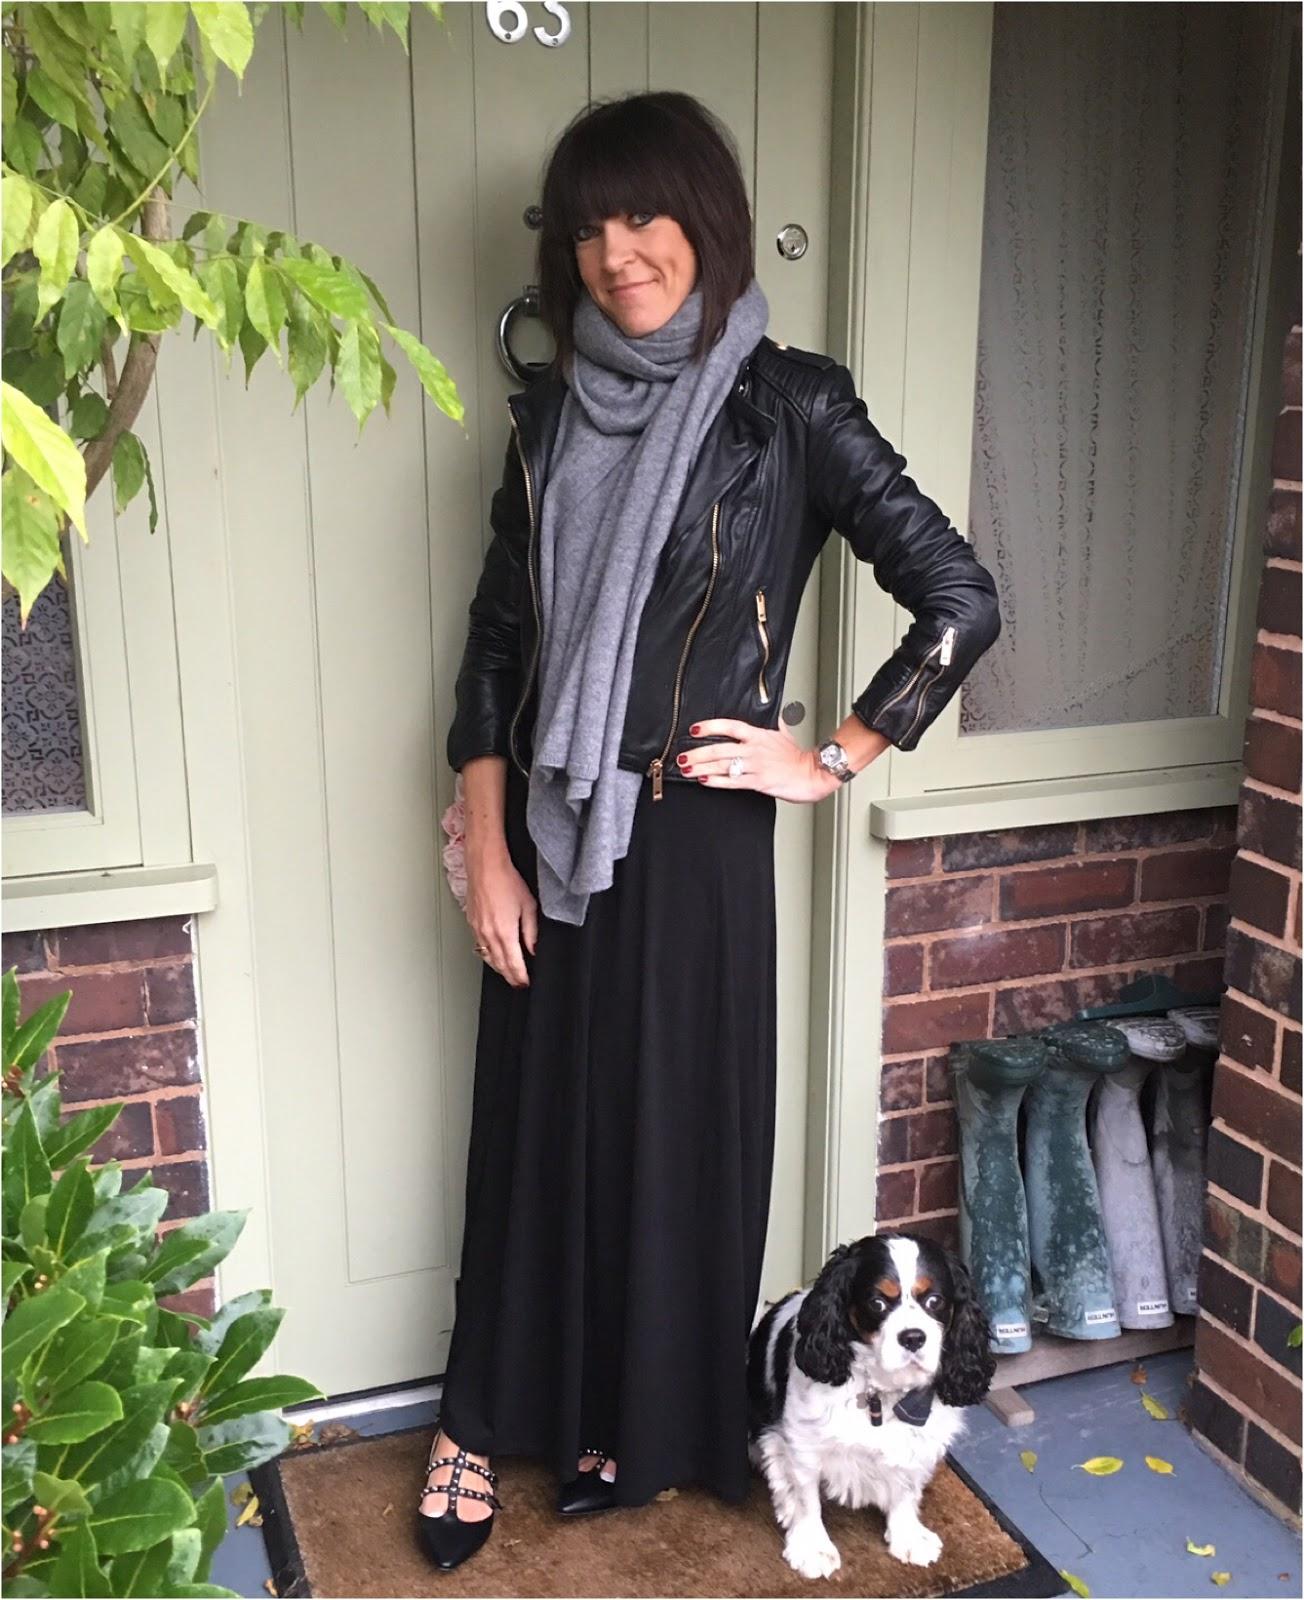 e2f39e1f0 My Midlife Fashion, Zara Cashmere Scarf, Kettlewell Colours maxi skirt,  Leather biker jacket